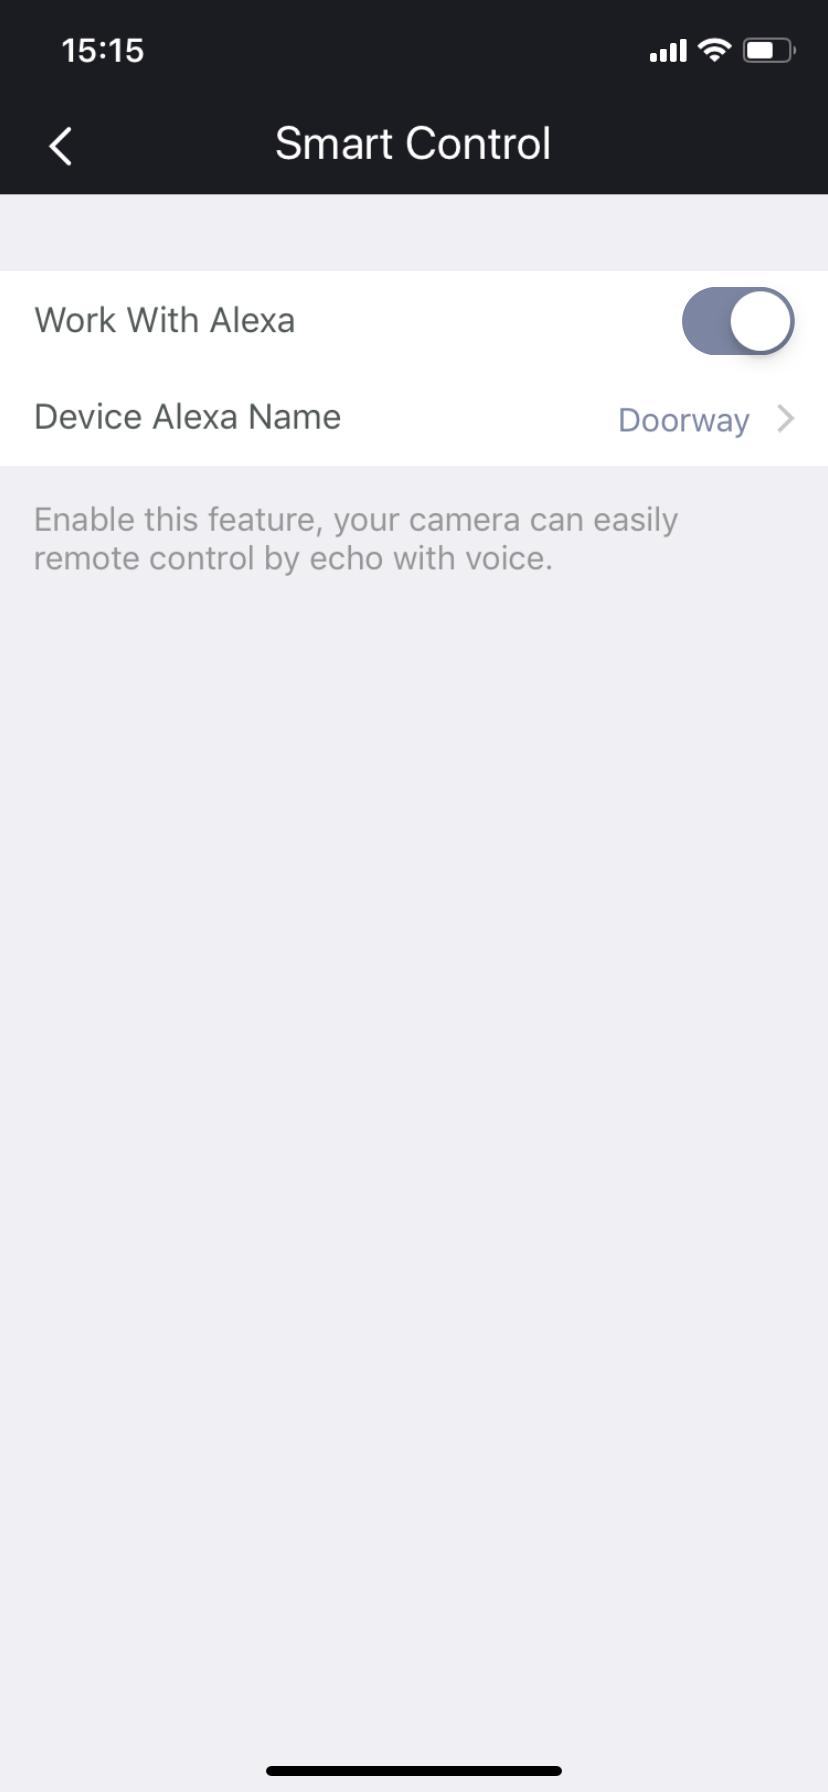 How to set up Foscam cameras working with Amazon's Alexa?-Foscam